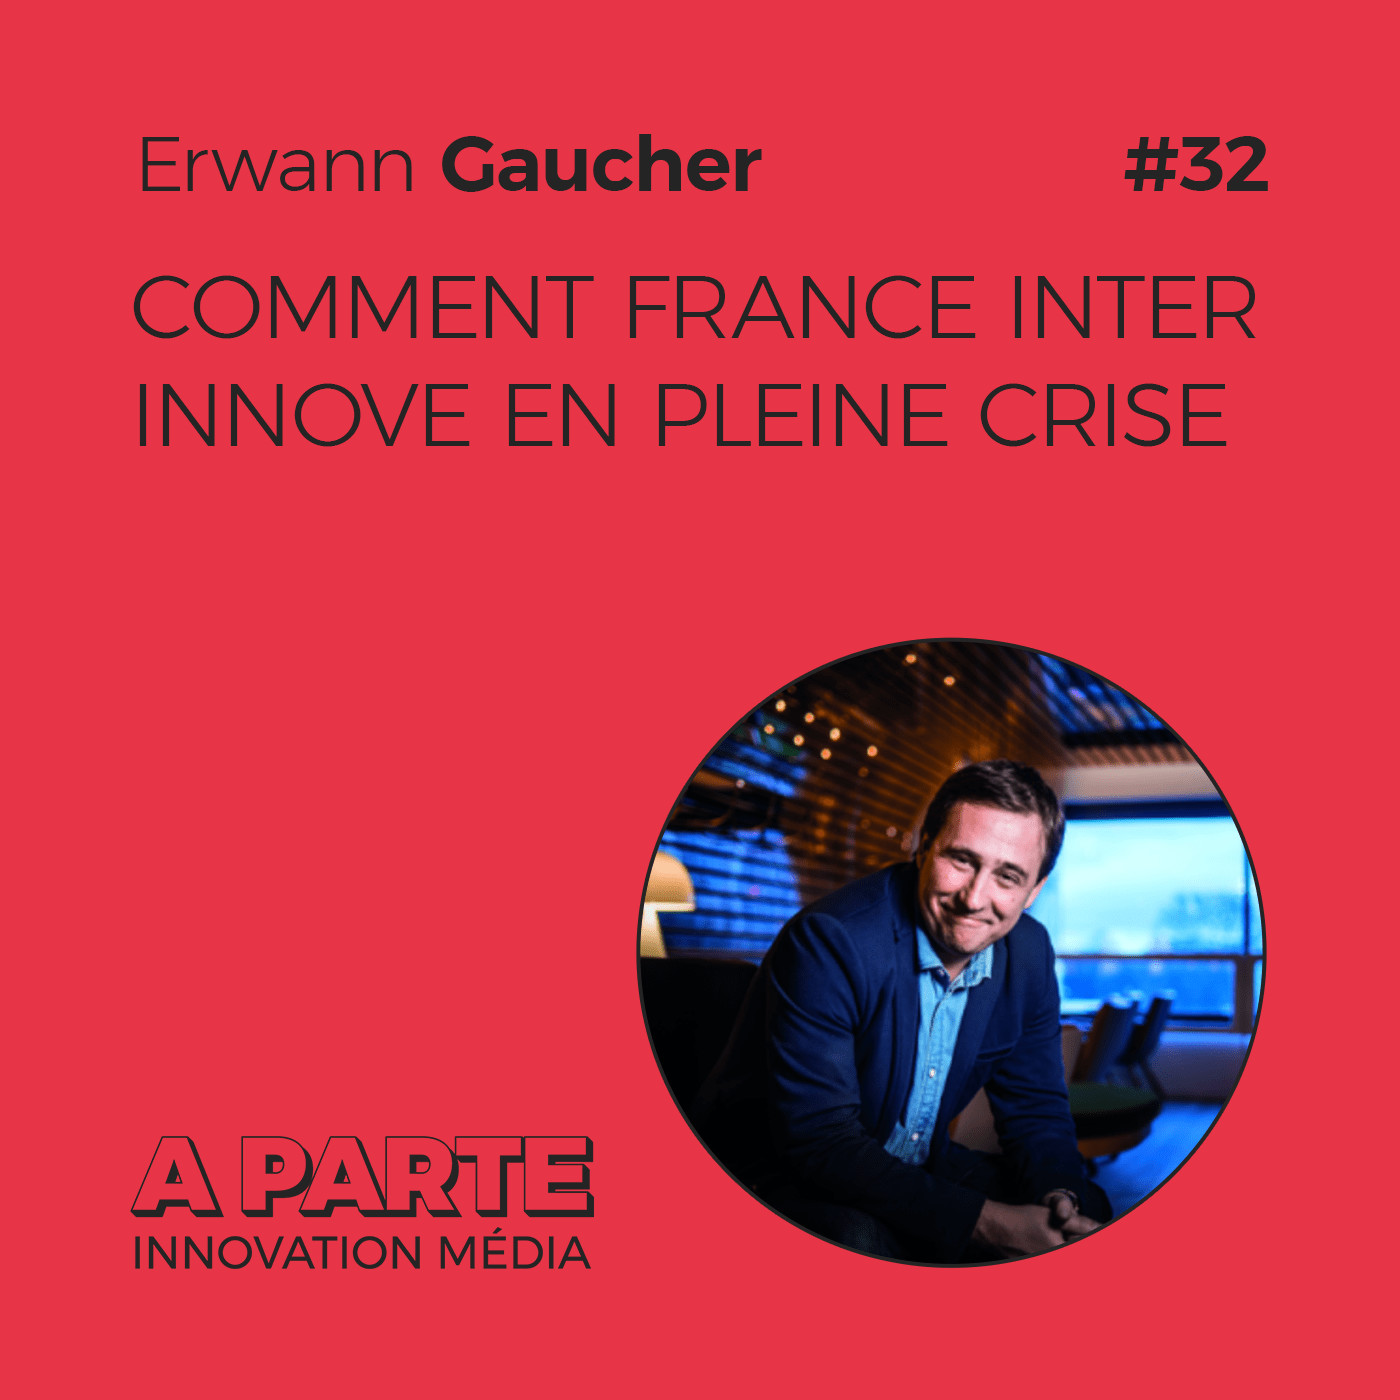 Comment France Inter innove en pleine crise, avec Erwann Gaucher